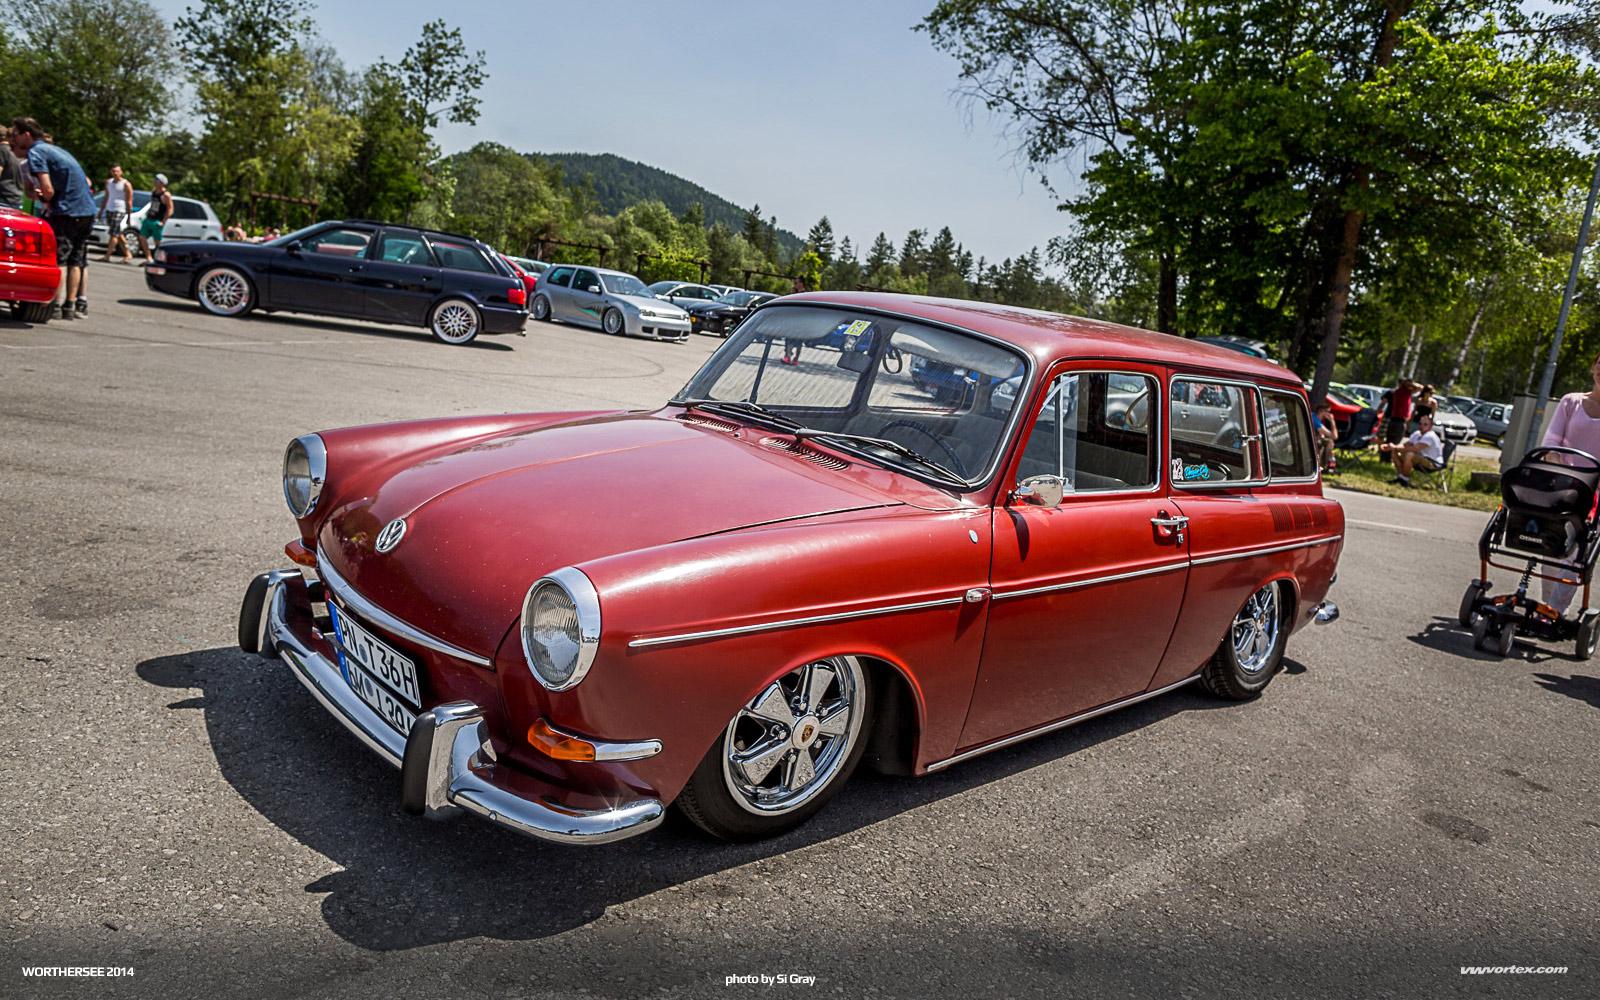 Audi-Exclusive-Havanna-Brown-A4-allroad-Pacific-German-1047